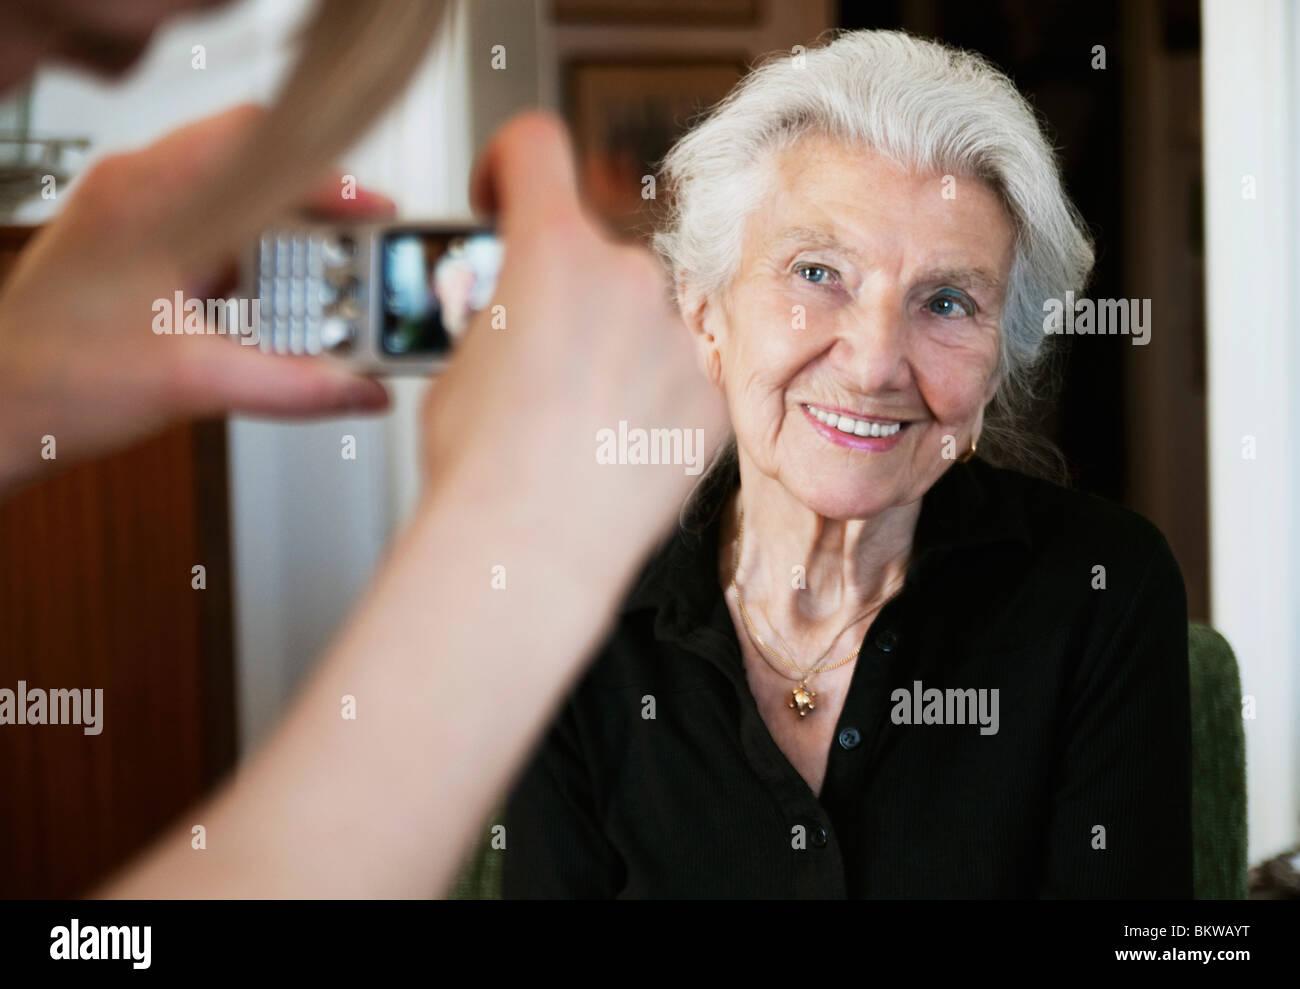 Frau, die Fotos mit Kamera-Handy Stockbild